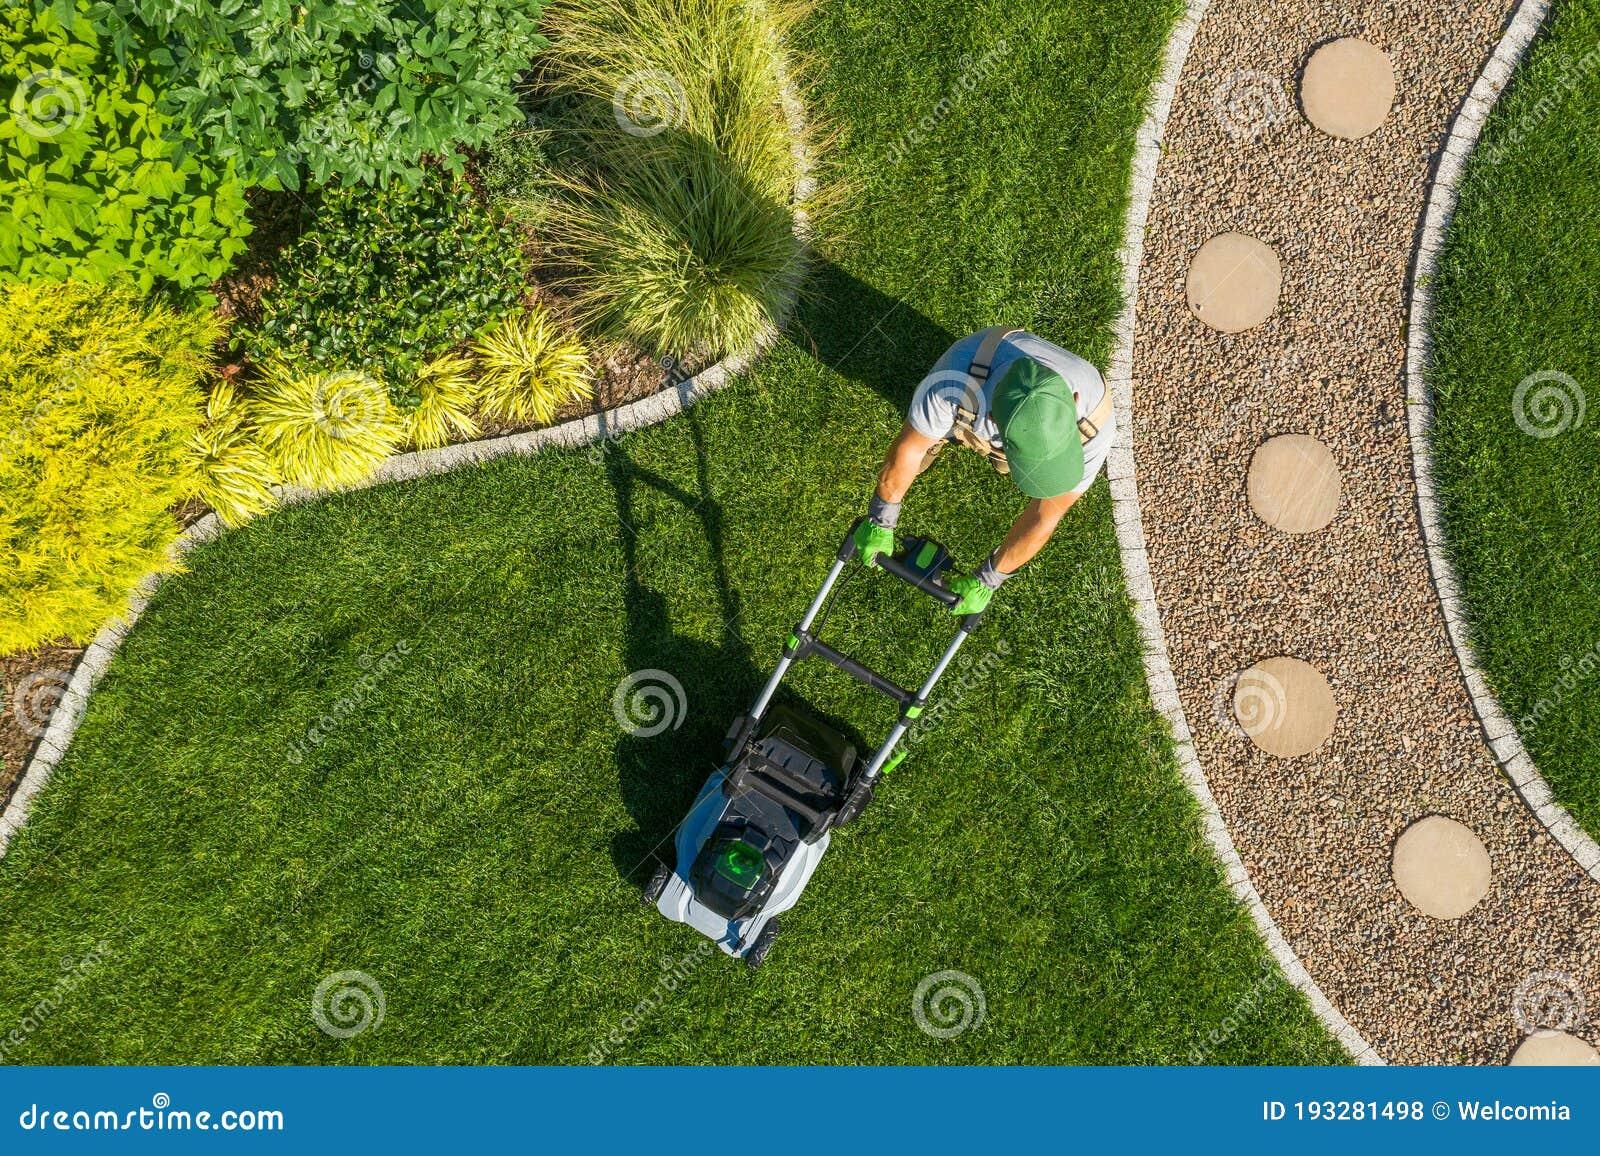 Gardener Mowing Backyard Garden Grass Aerial View Stock Photo Image Of Trimming Landscaping 193281498